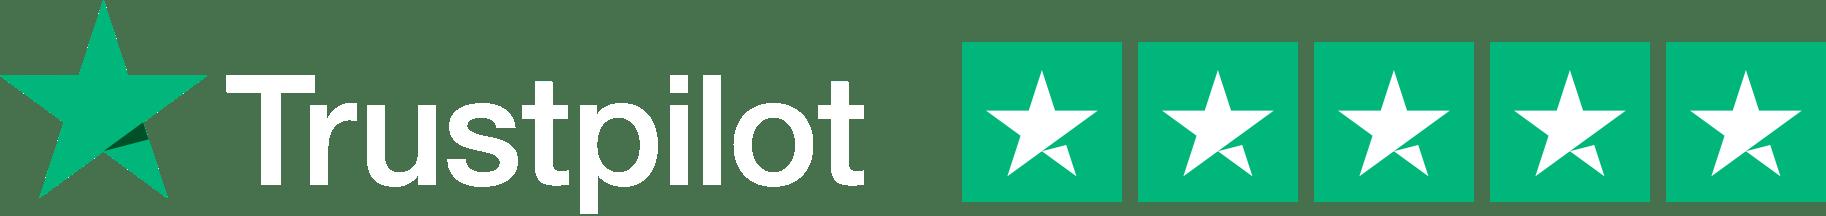 trustpilot-inline-white